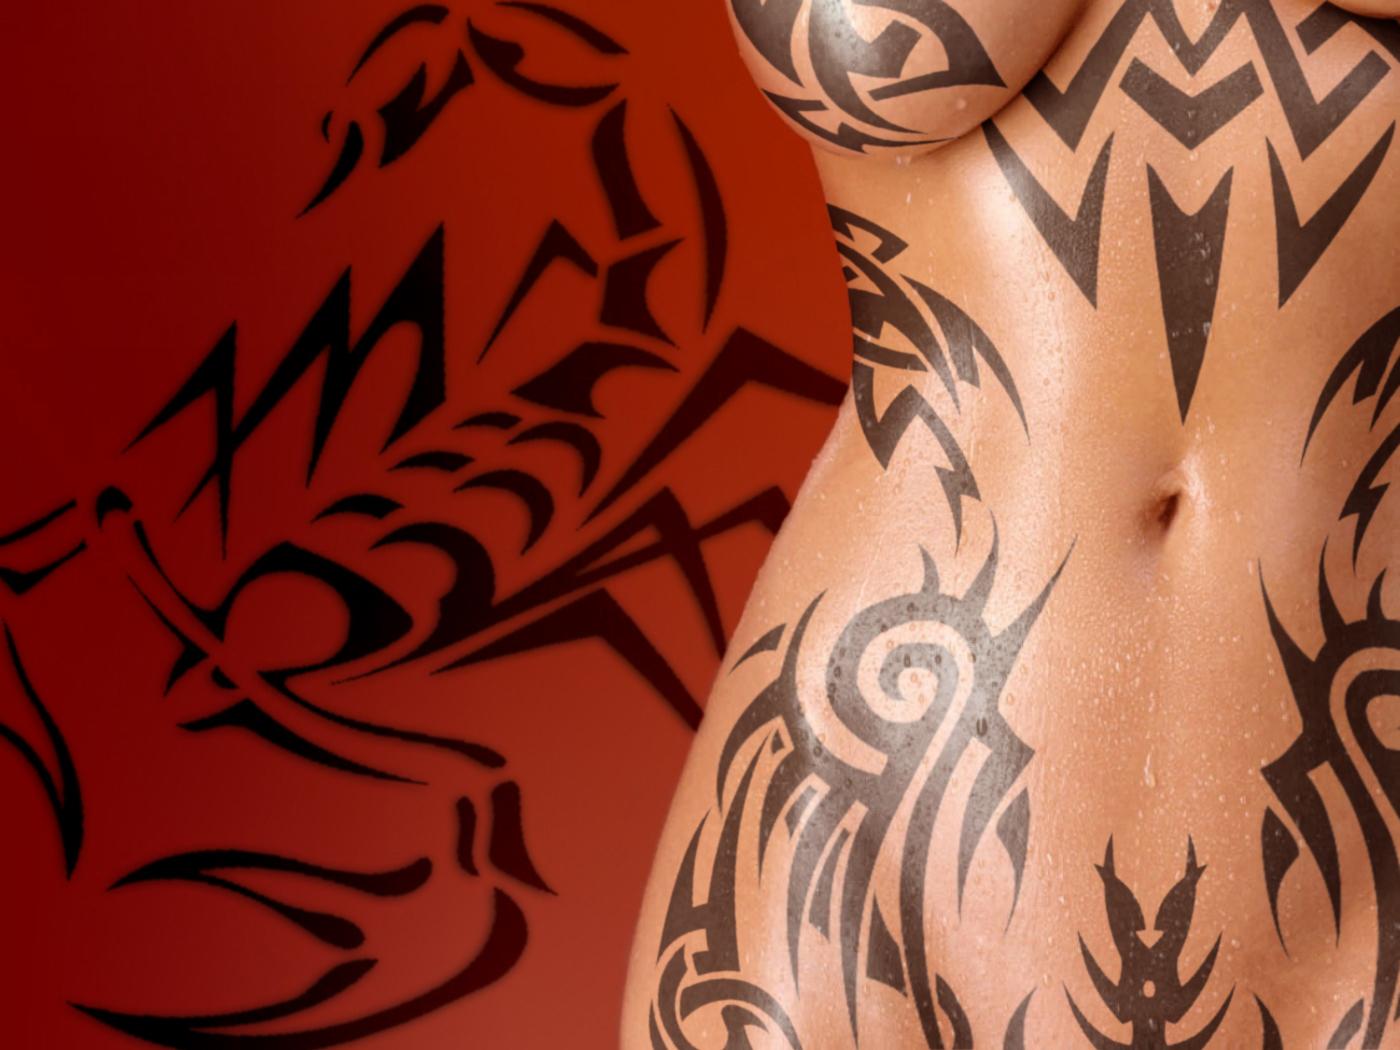 Tatoo Scorpion Girl 2 by DDL999